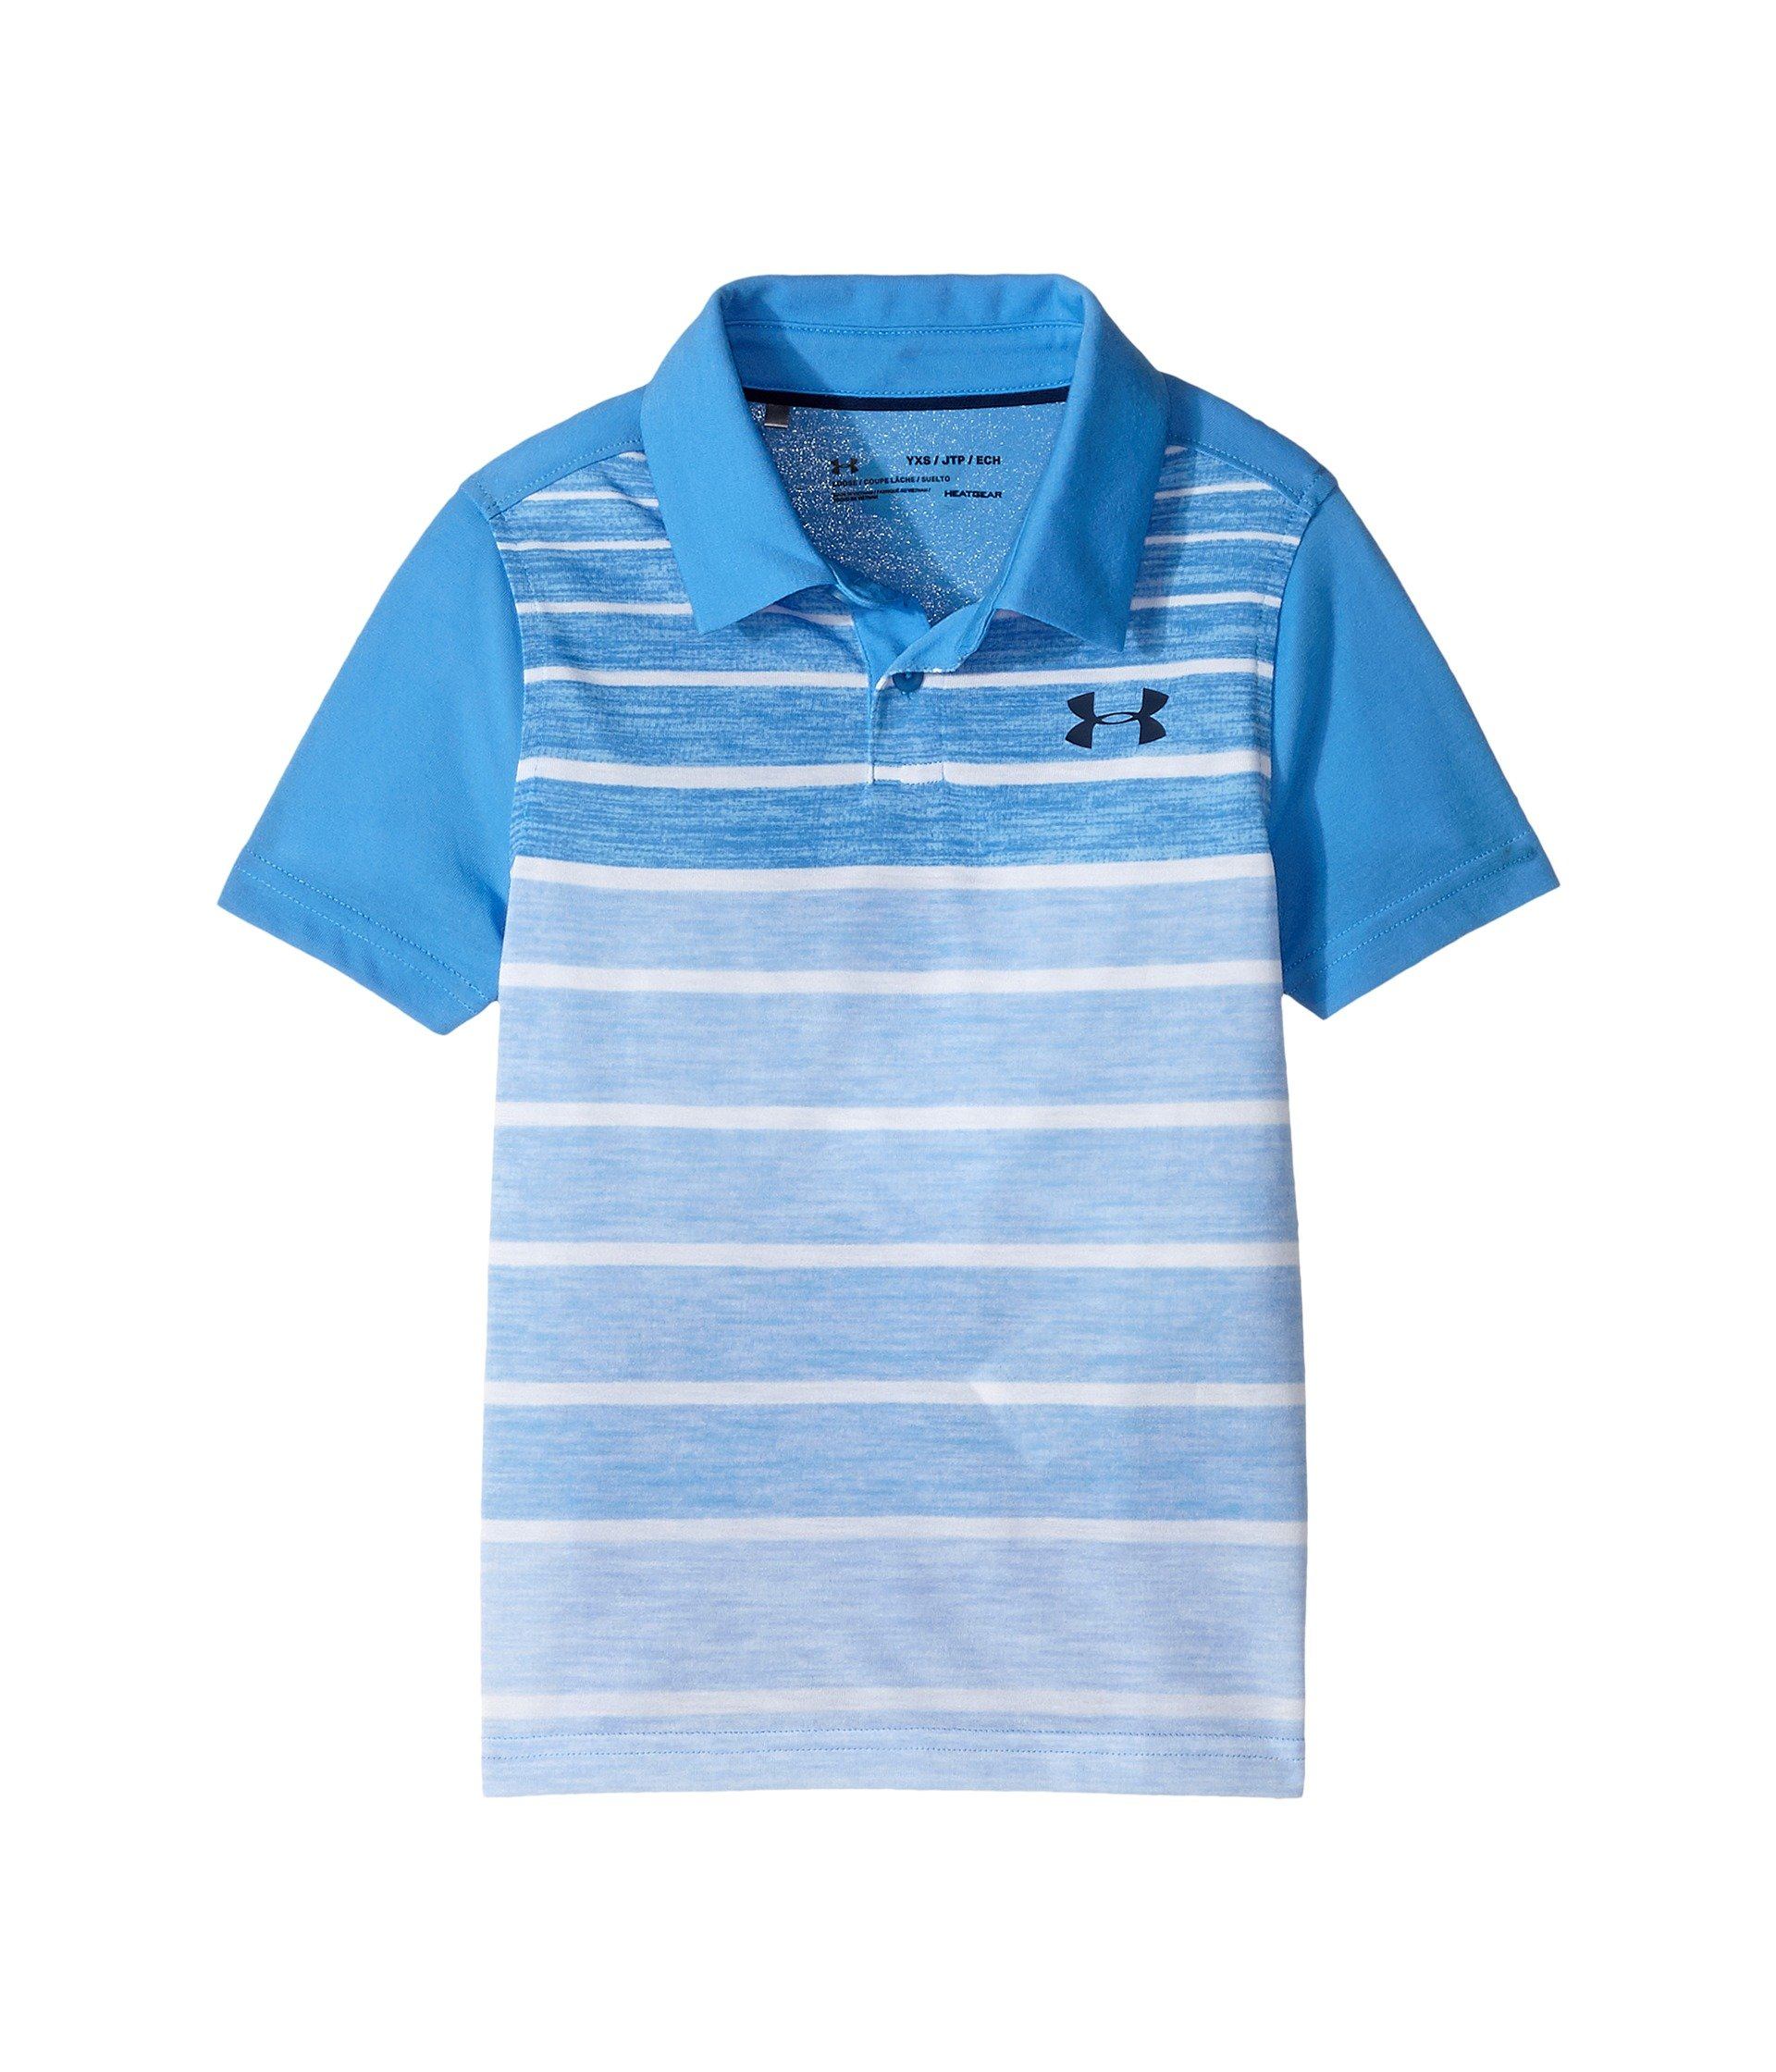 Under Armour Kids Boy's Threadborne Polo (Big Kids) Mako Blue/Academy/Academy Shirt